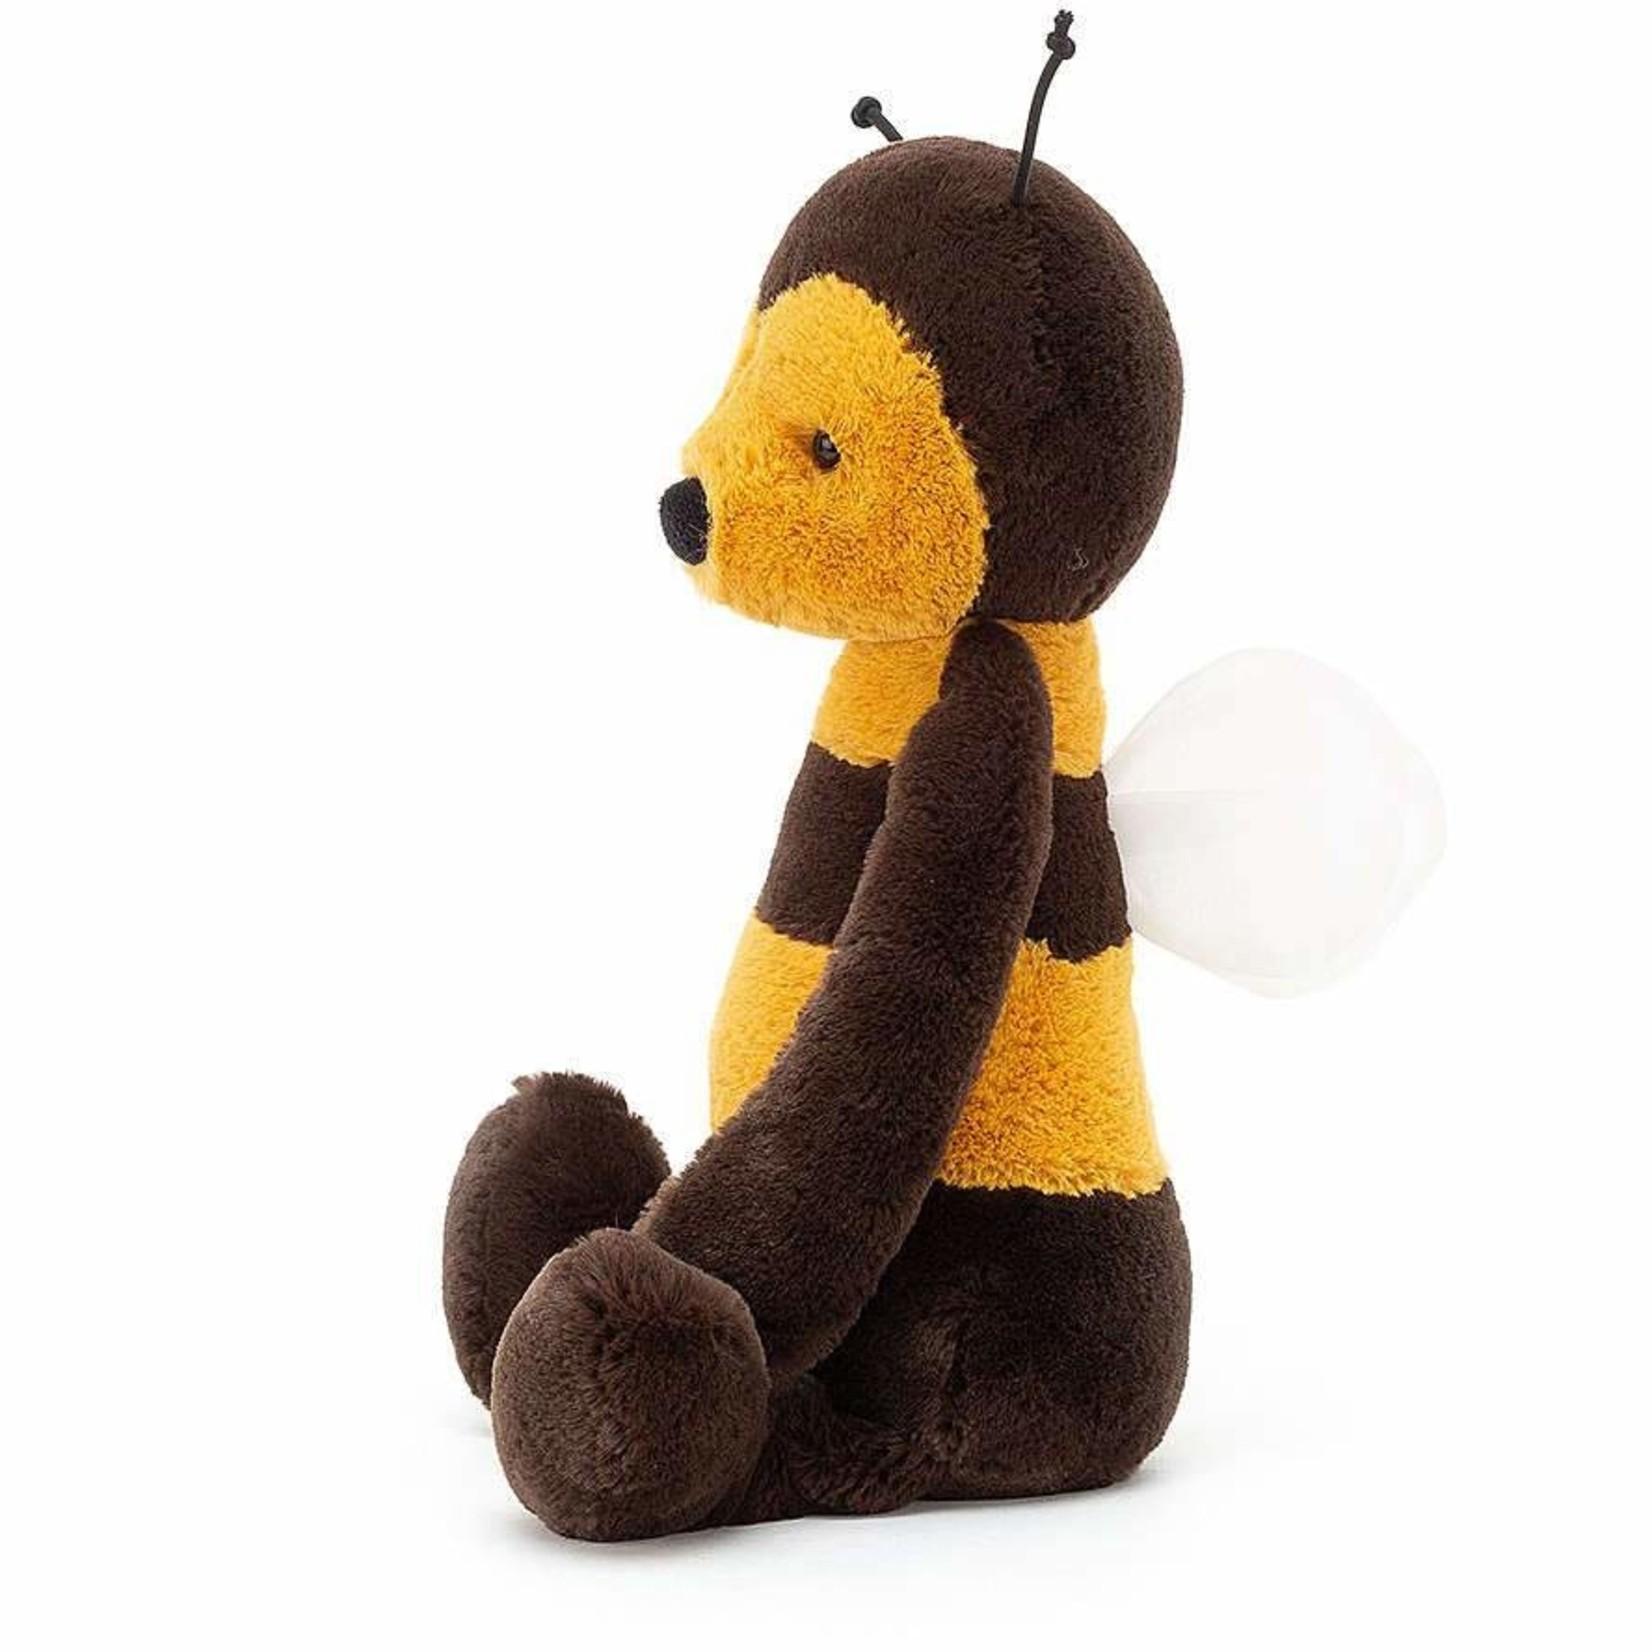 JELLYCAT BASHFUL BEE MEDIUM